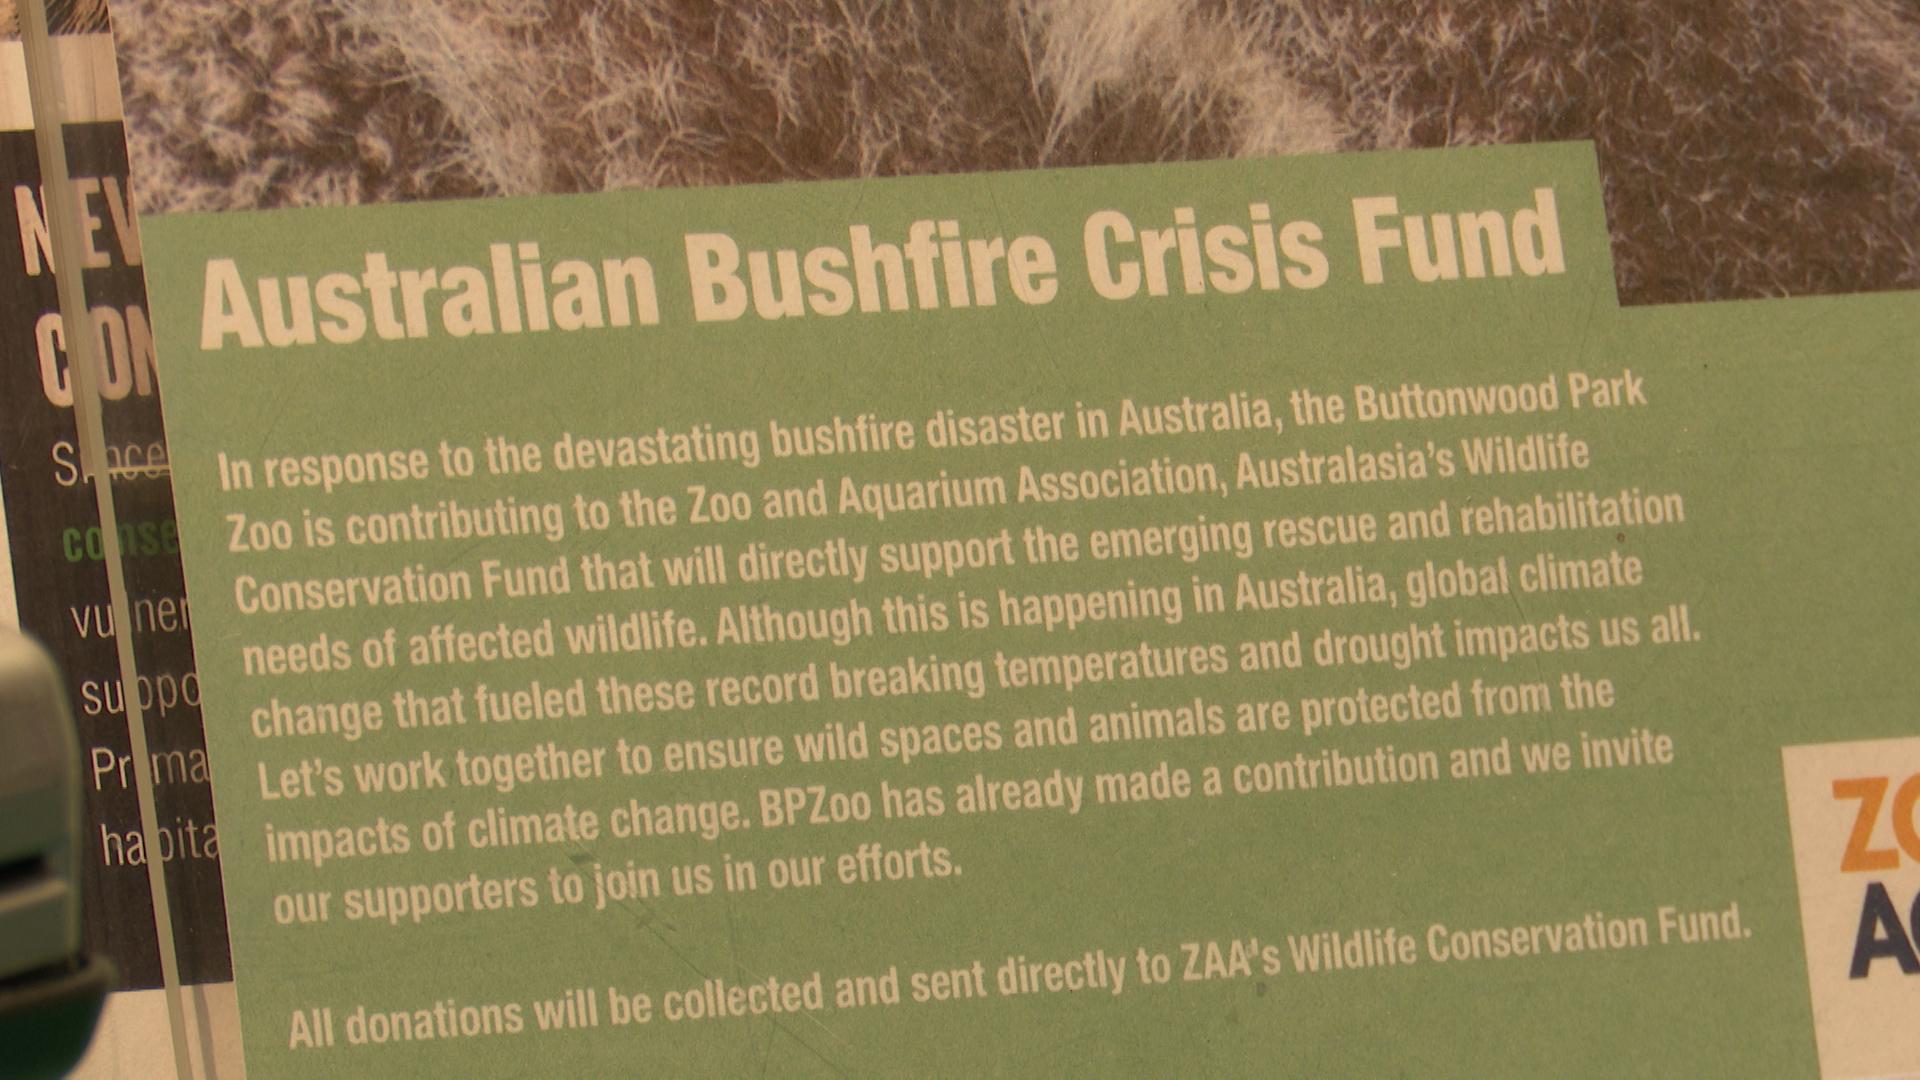 Australian Bushfire Crisis Fund